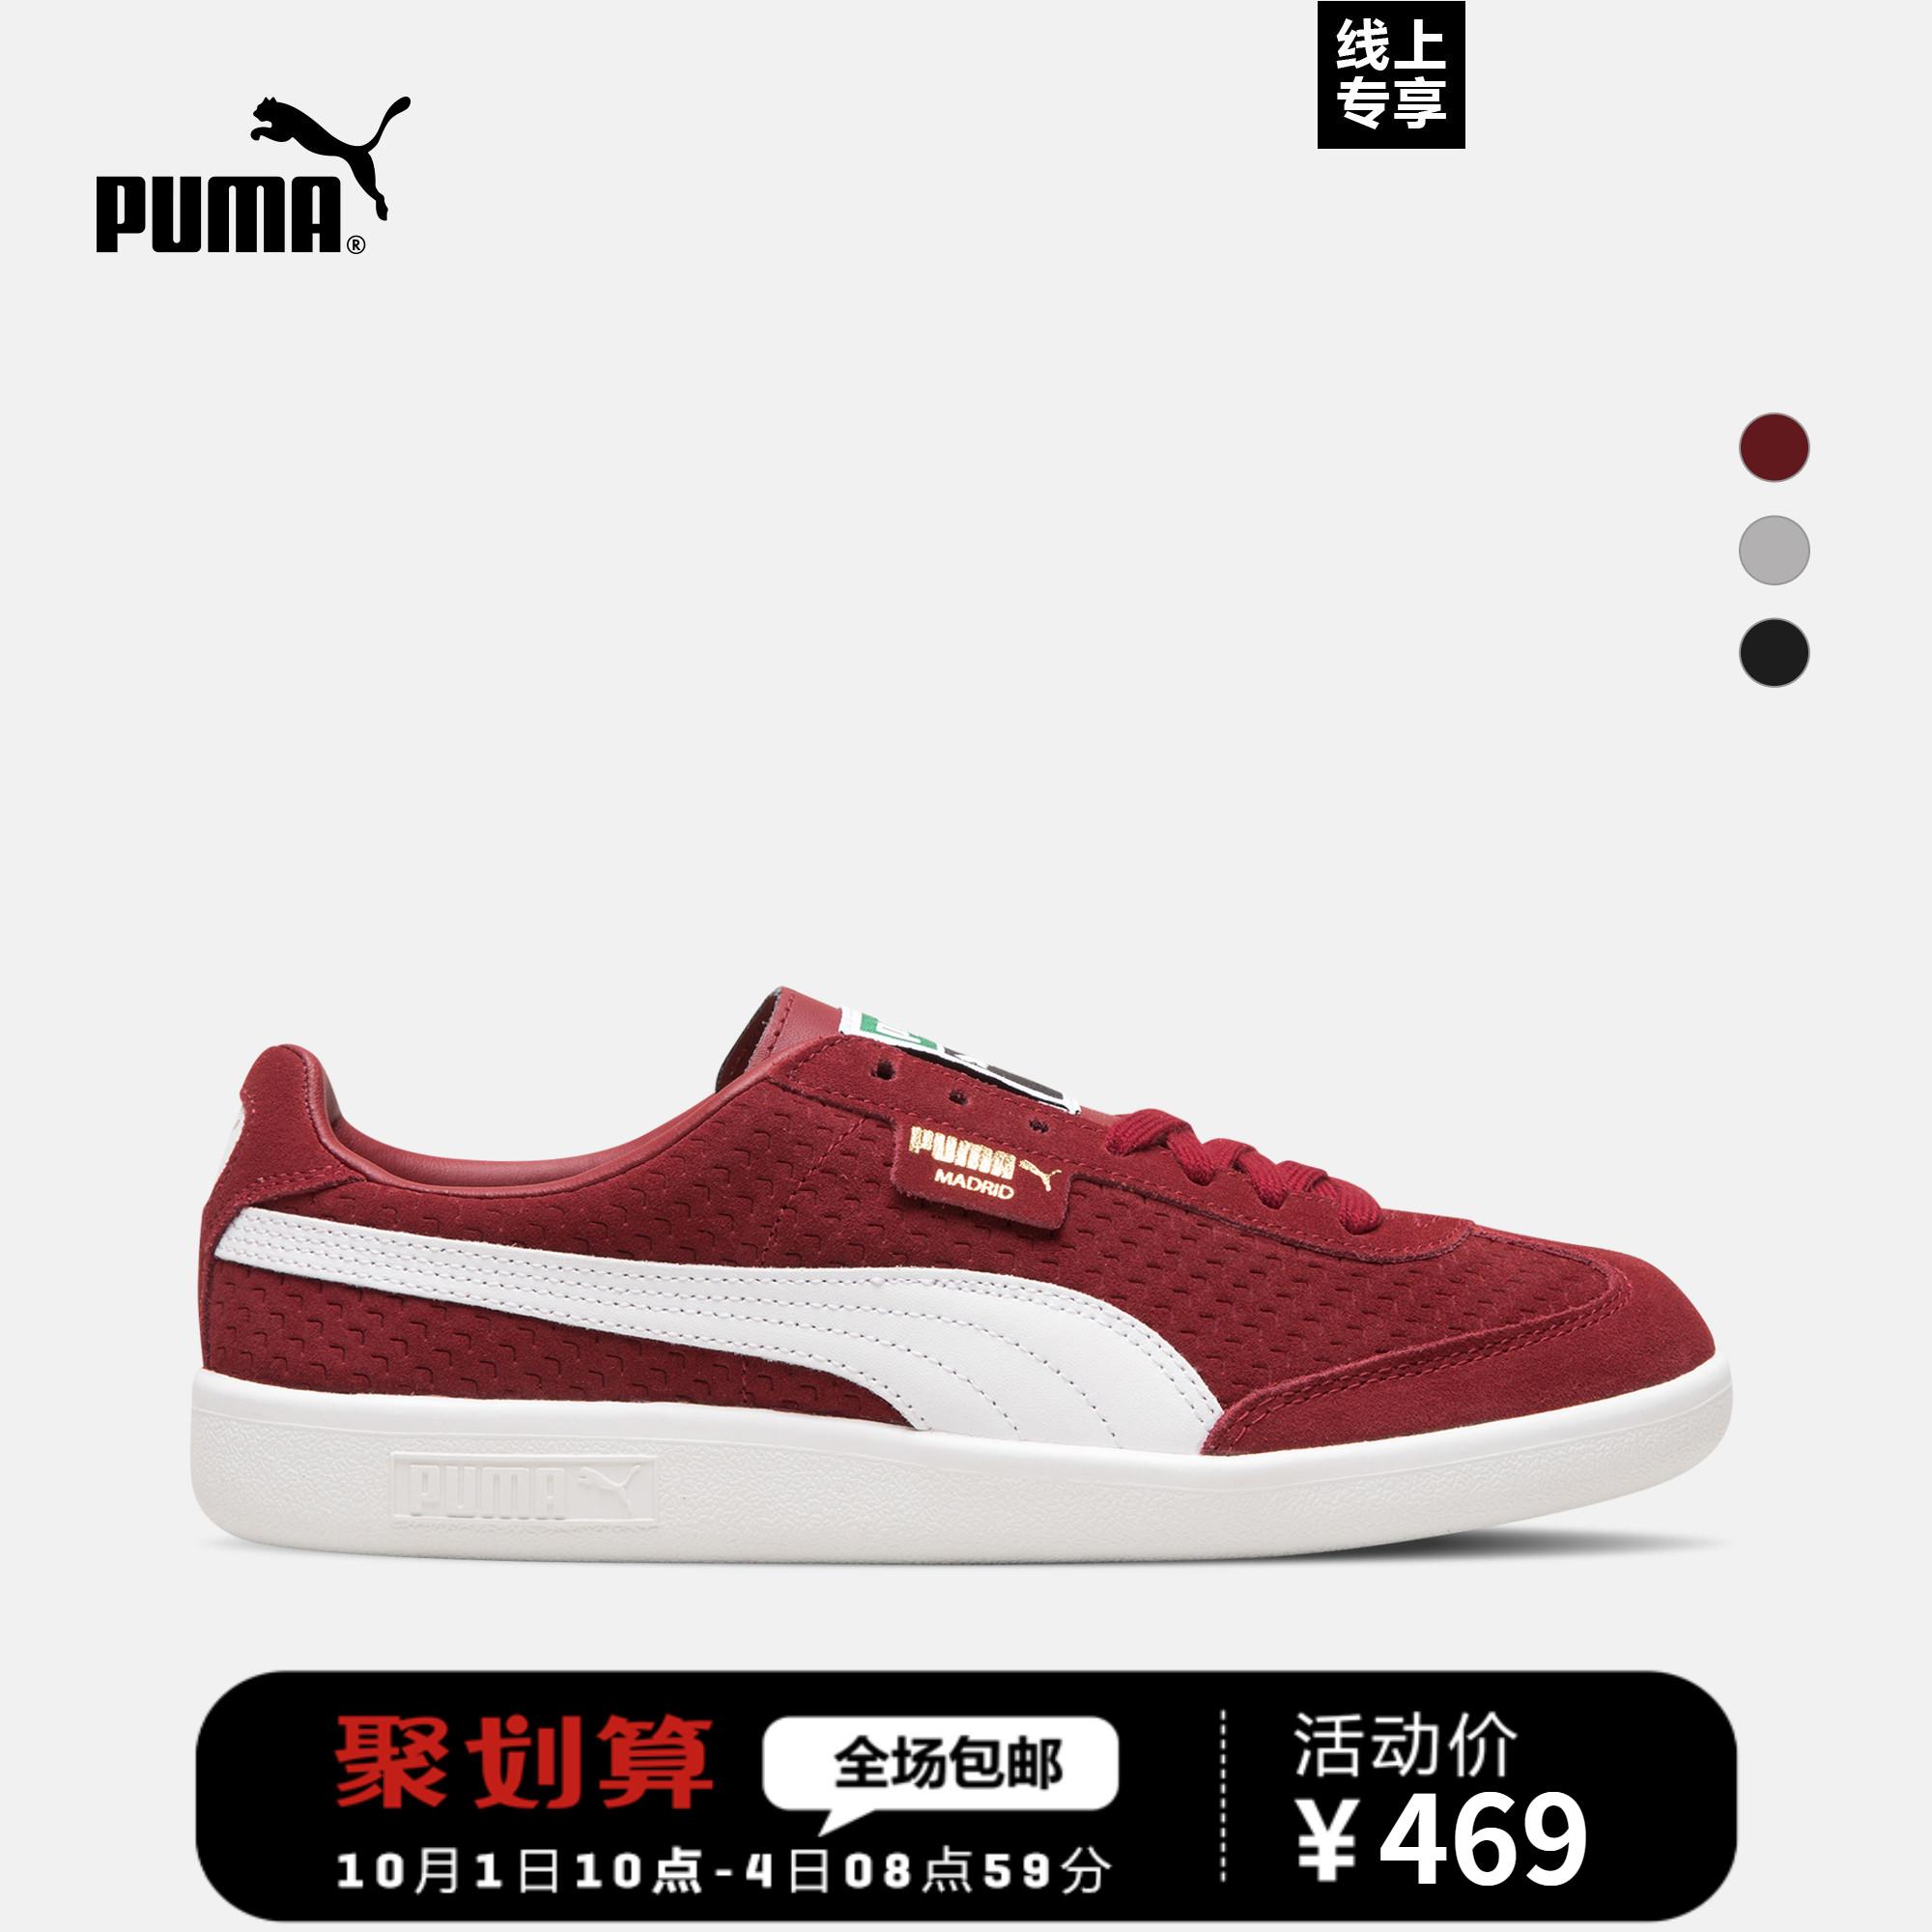 PUMA彪马官方 男女同款休闲鞋 Madrid Perforated SUEDE 365446